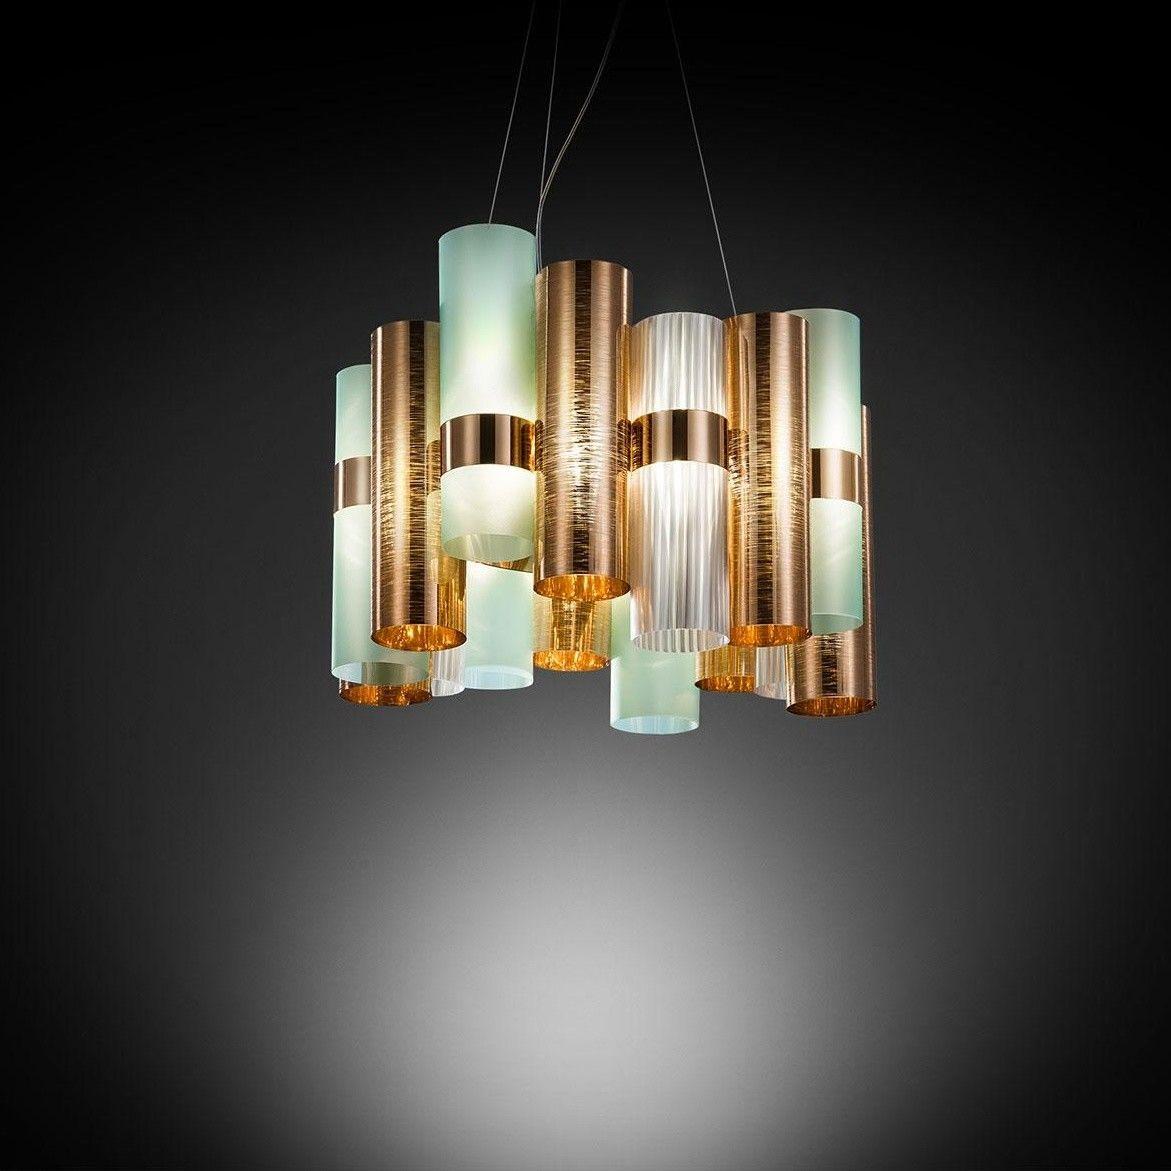 la lollo led suspension lamp slamp. Black Bedroom Furniture Sets. Home Design Ideas